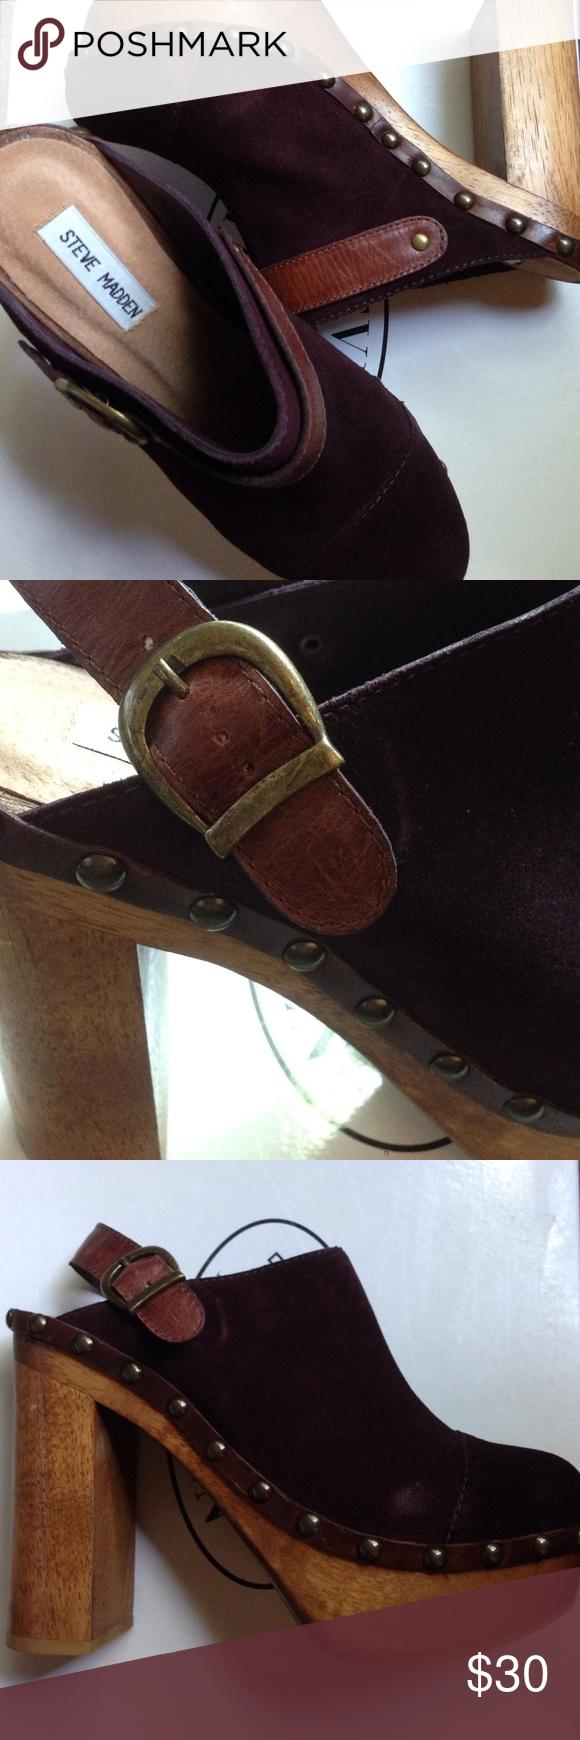 Steve Madden burgundy Ceceila clog Steve Madden burgundy suede Ceceila clog...NEW Steve Madden Shoes Mules & Clogs